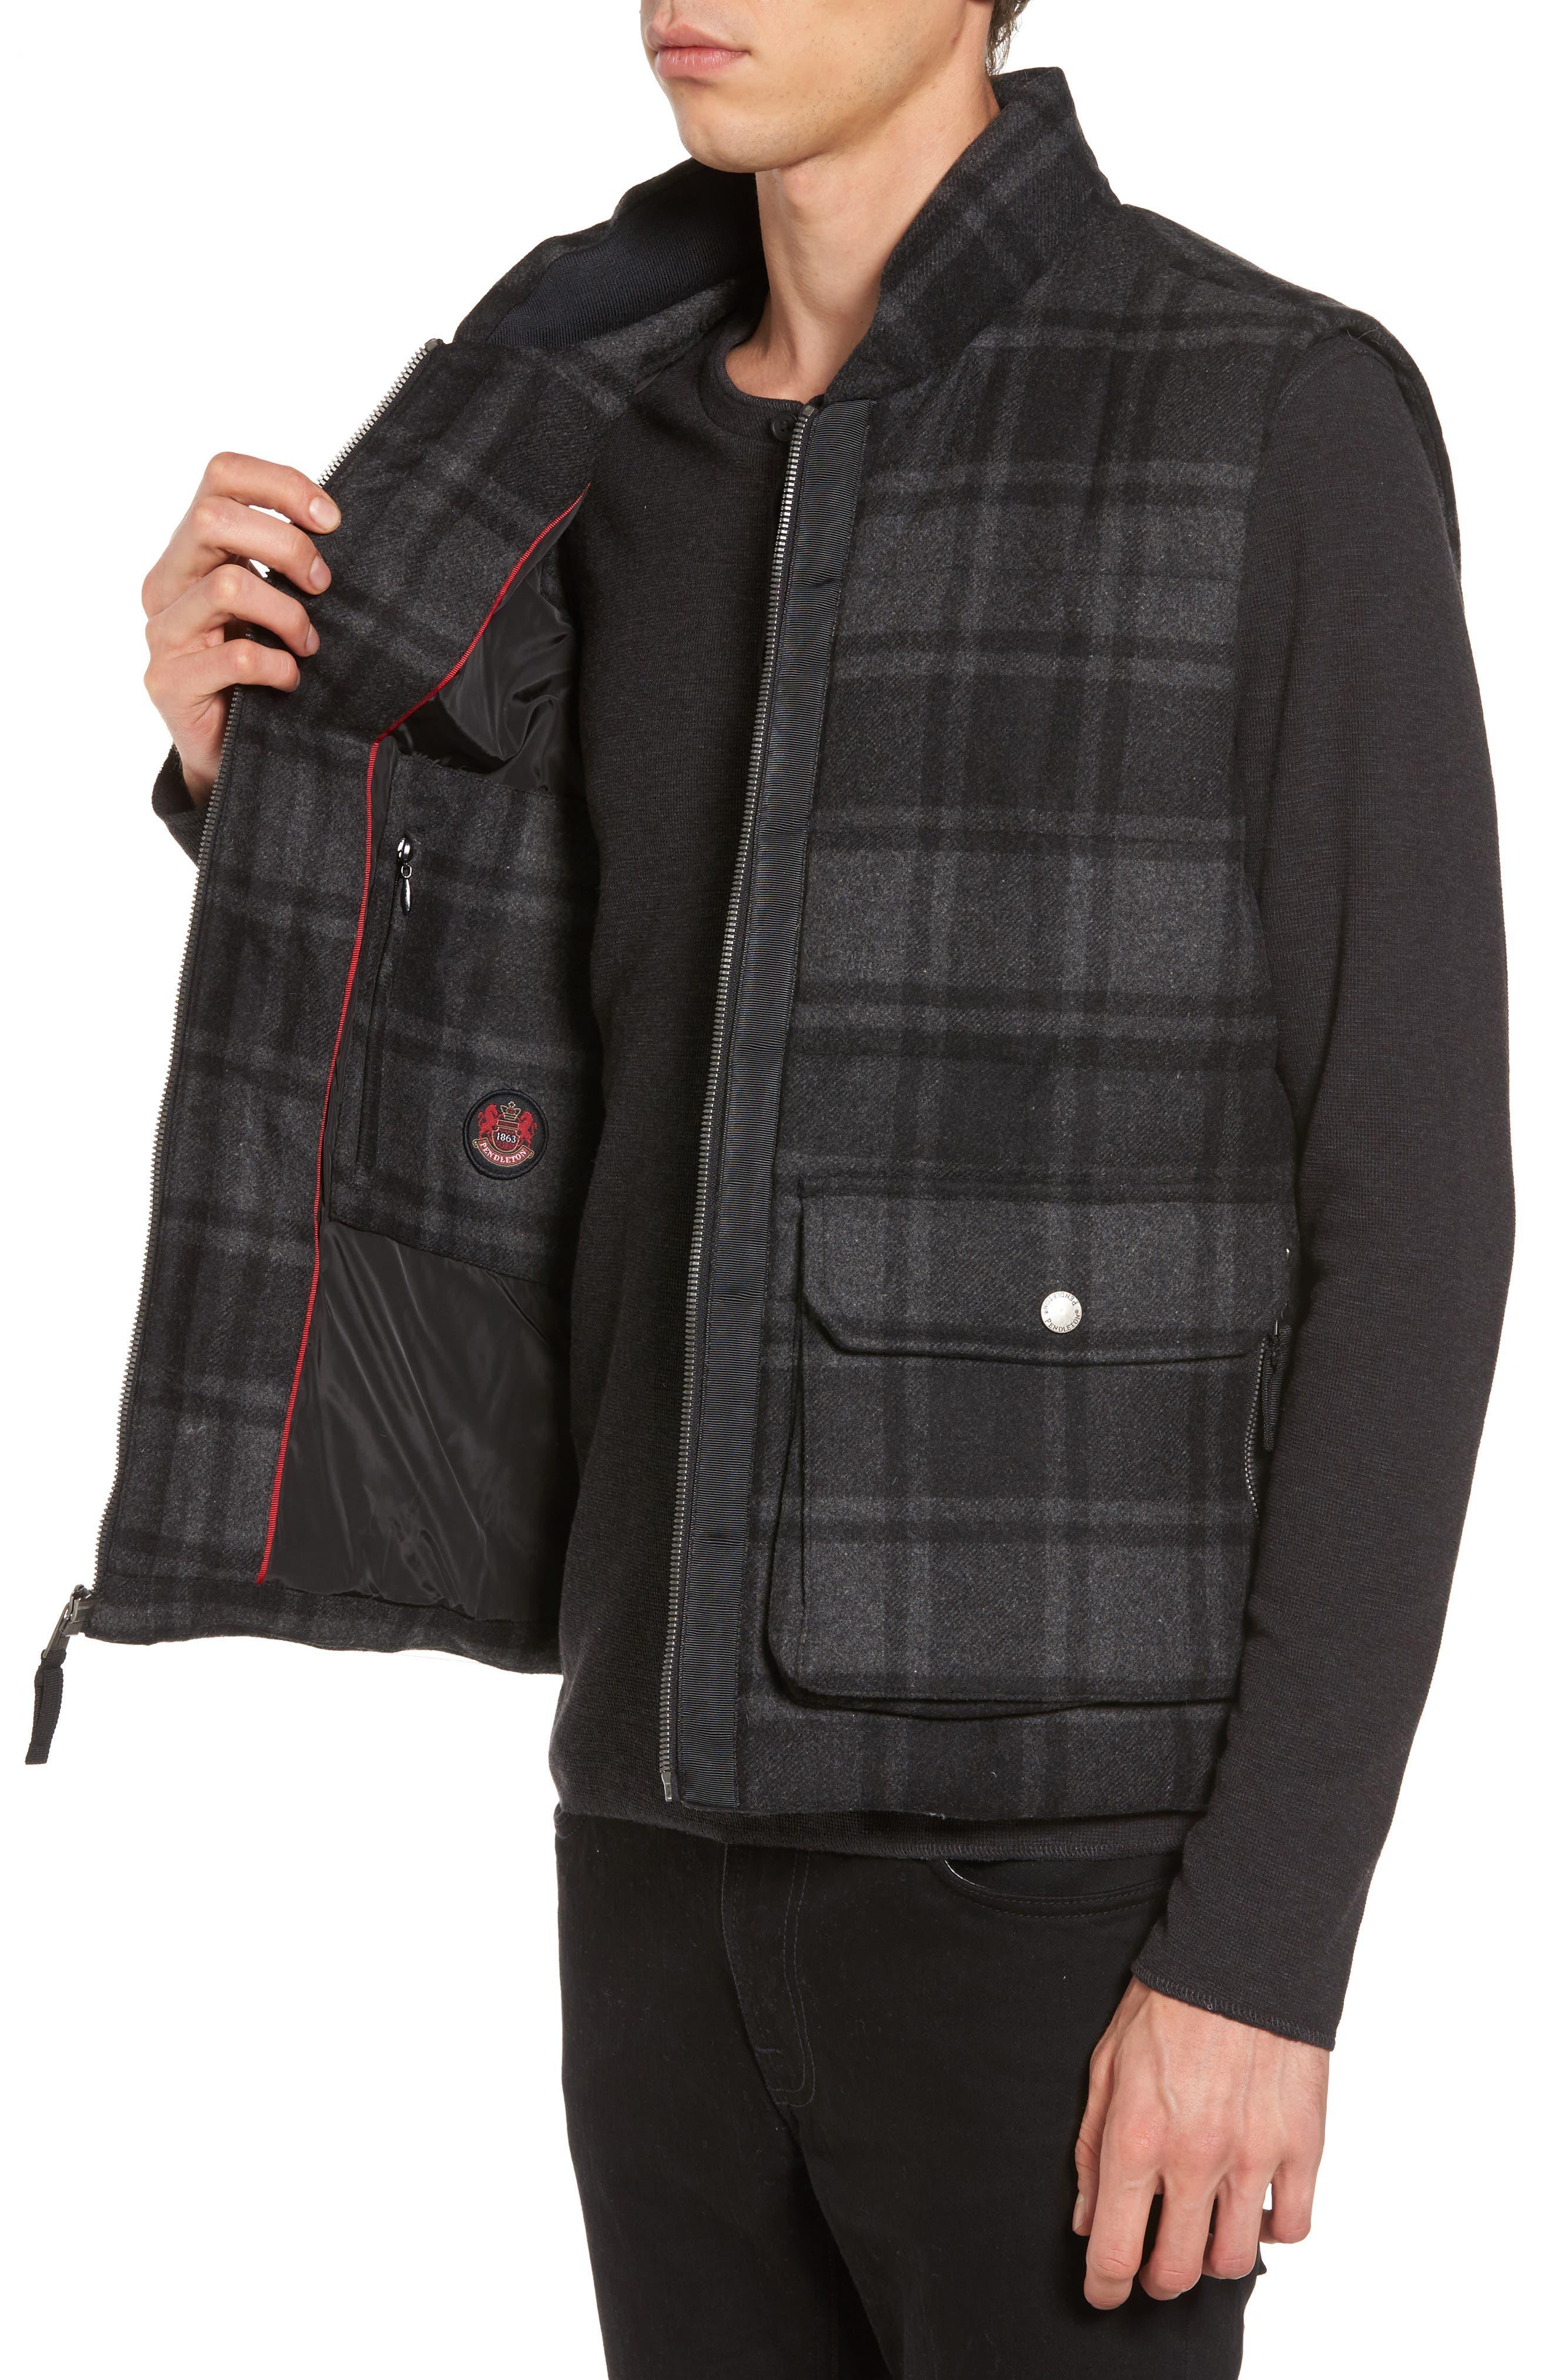 Yosemite Jacket,                             Alternate thumbnail 3, color,                             Black/ Charcoal Plaid